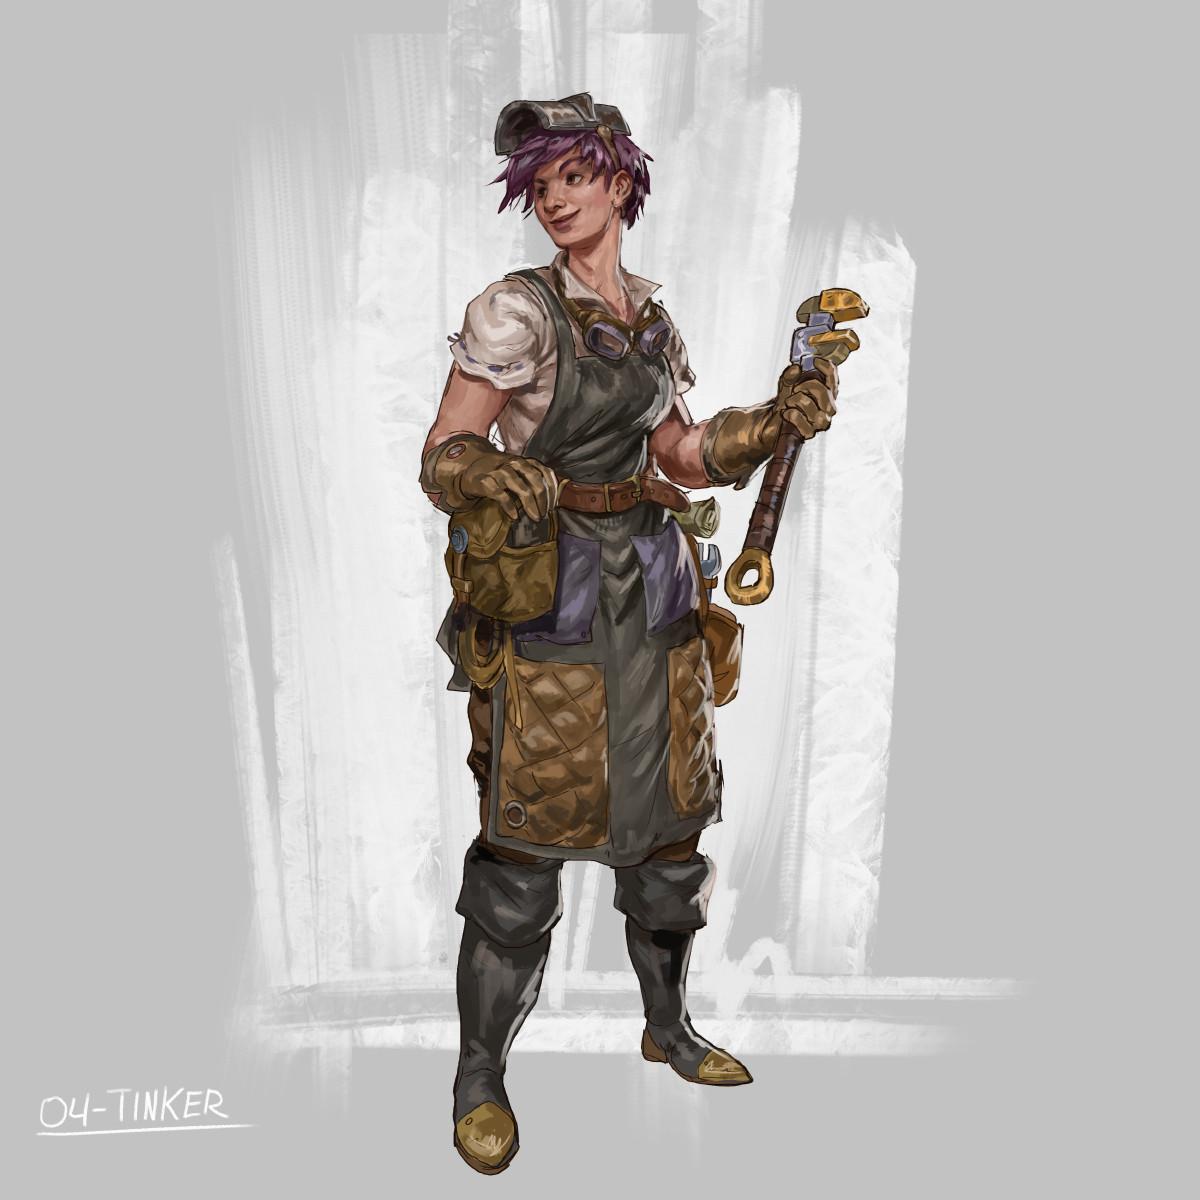 RPG Class day 04: tinker